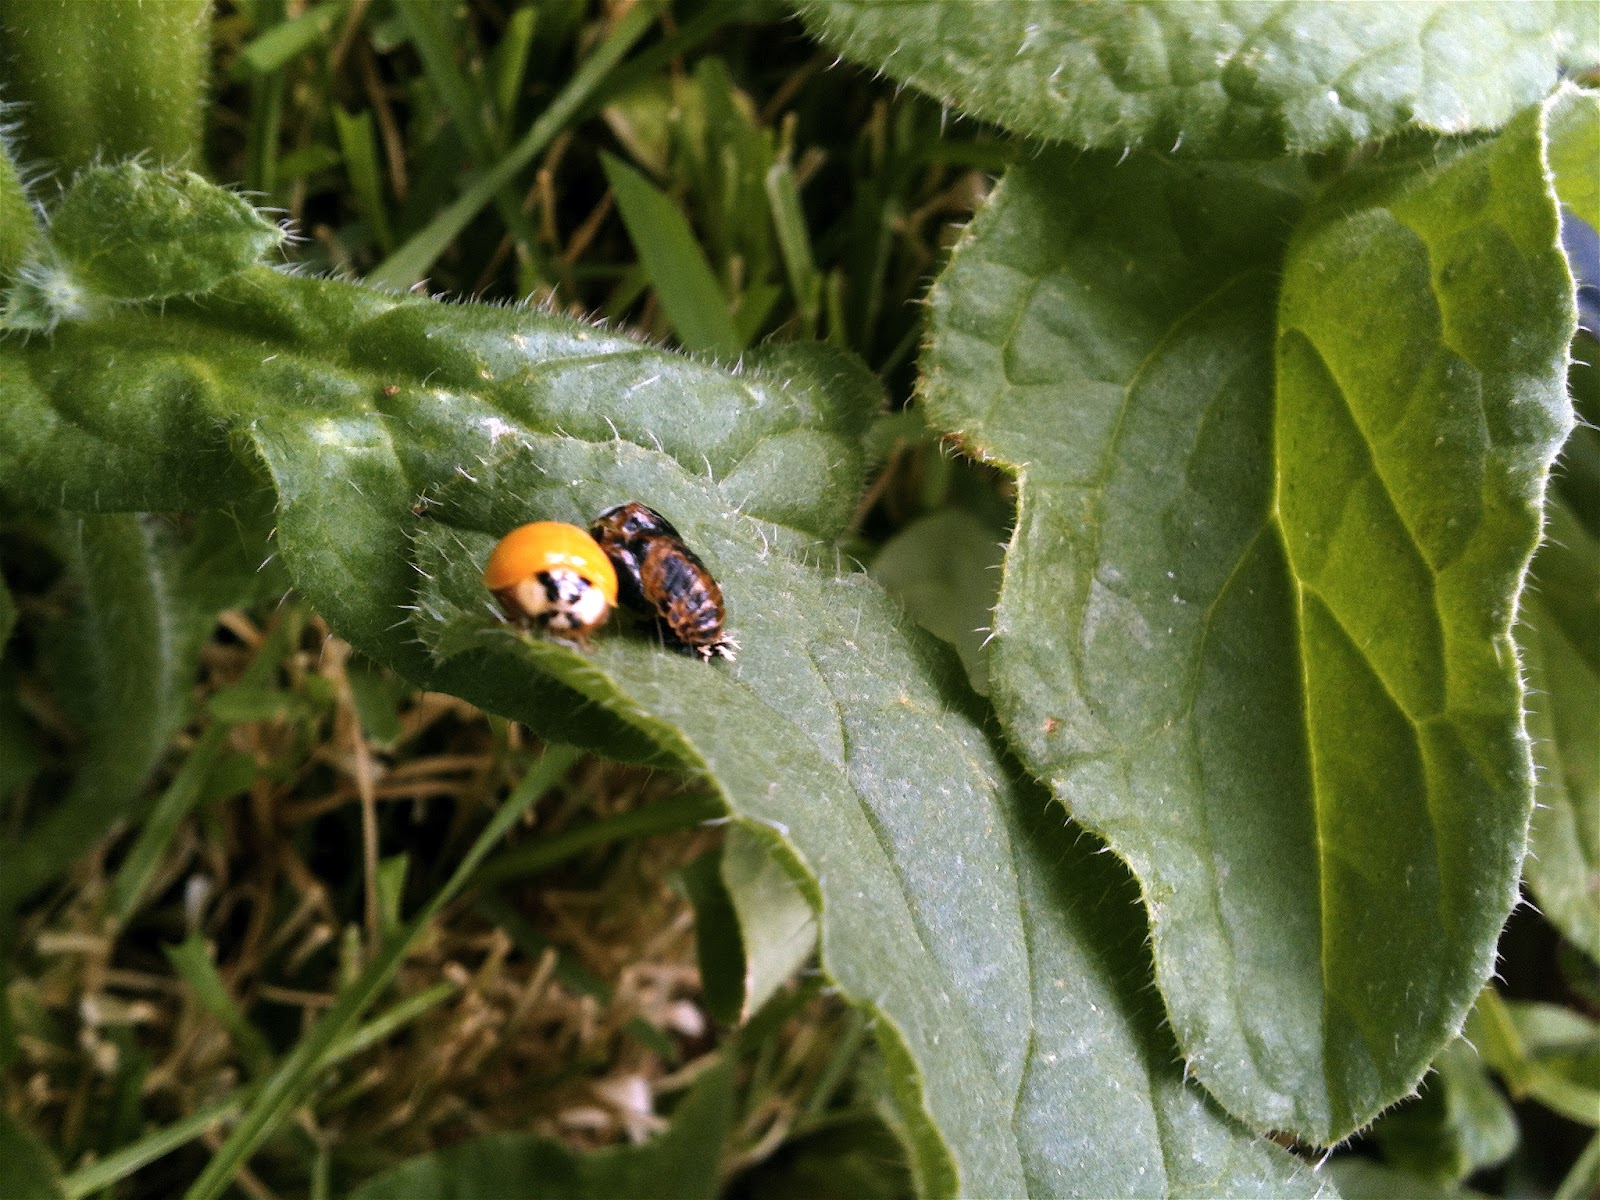 Orange Ladybug No Spots